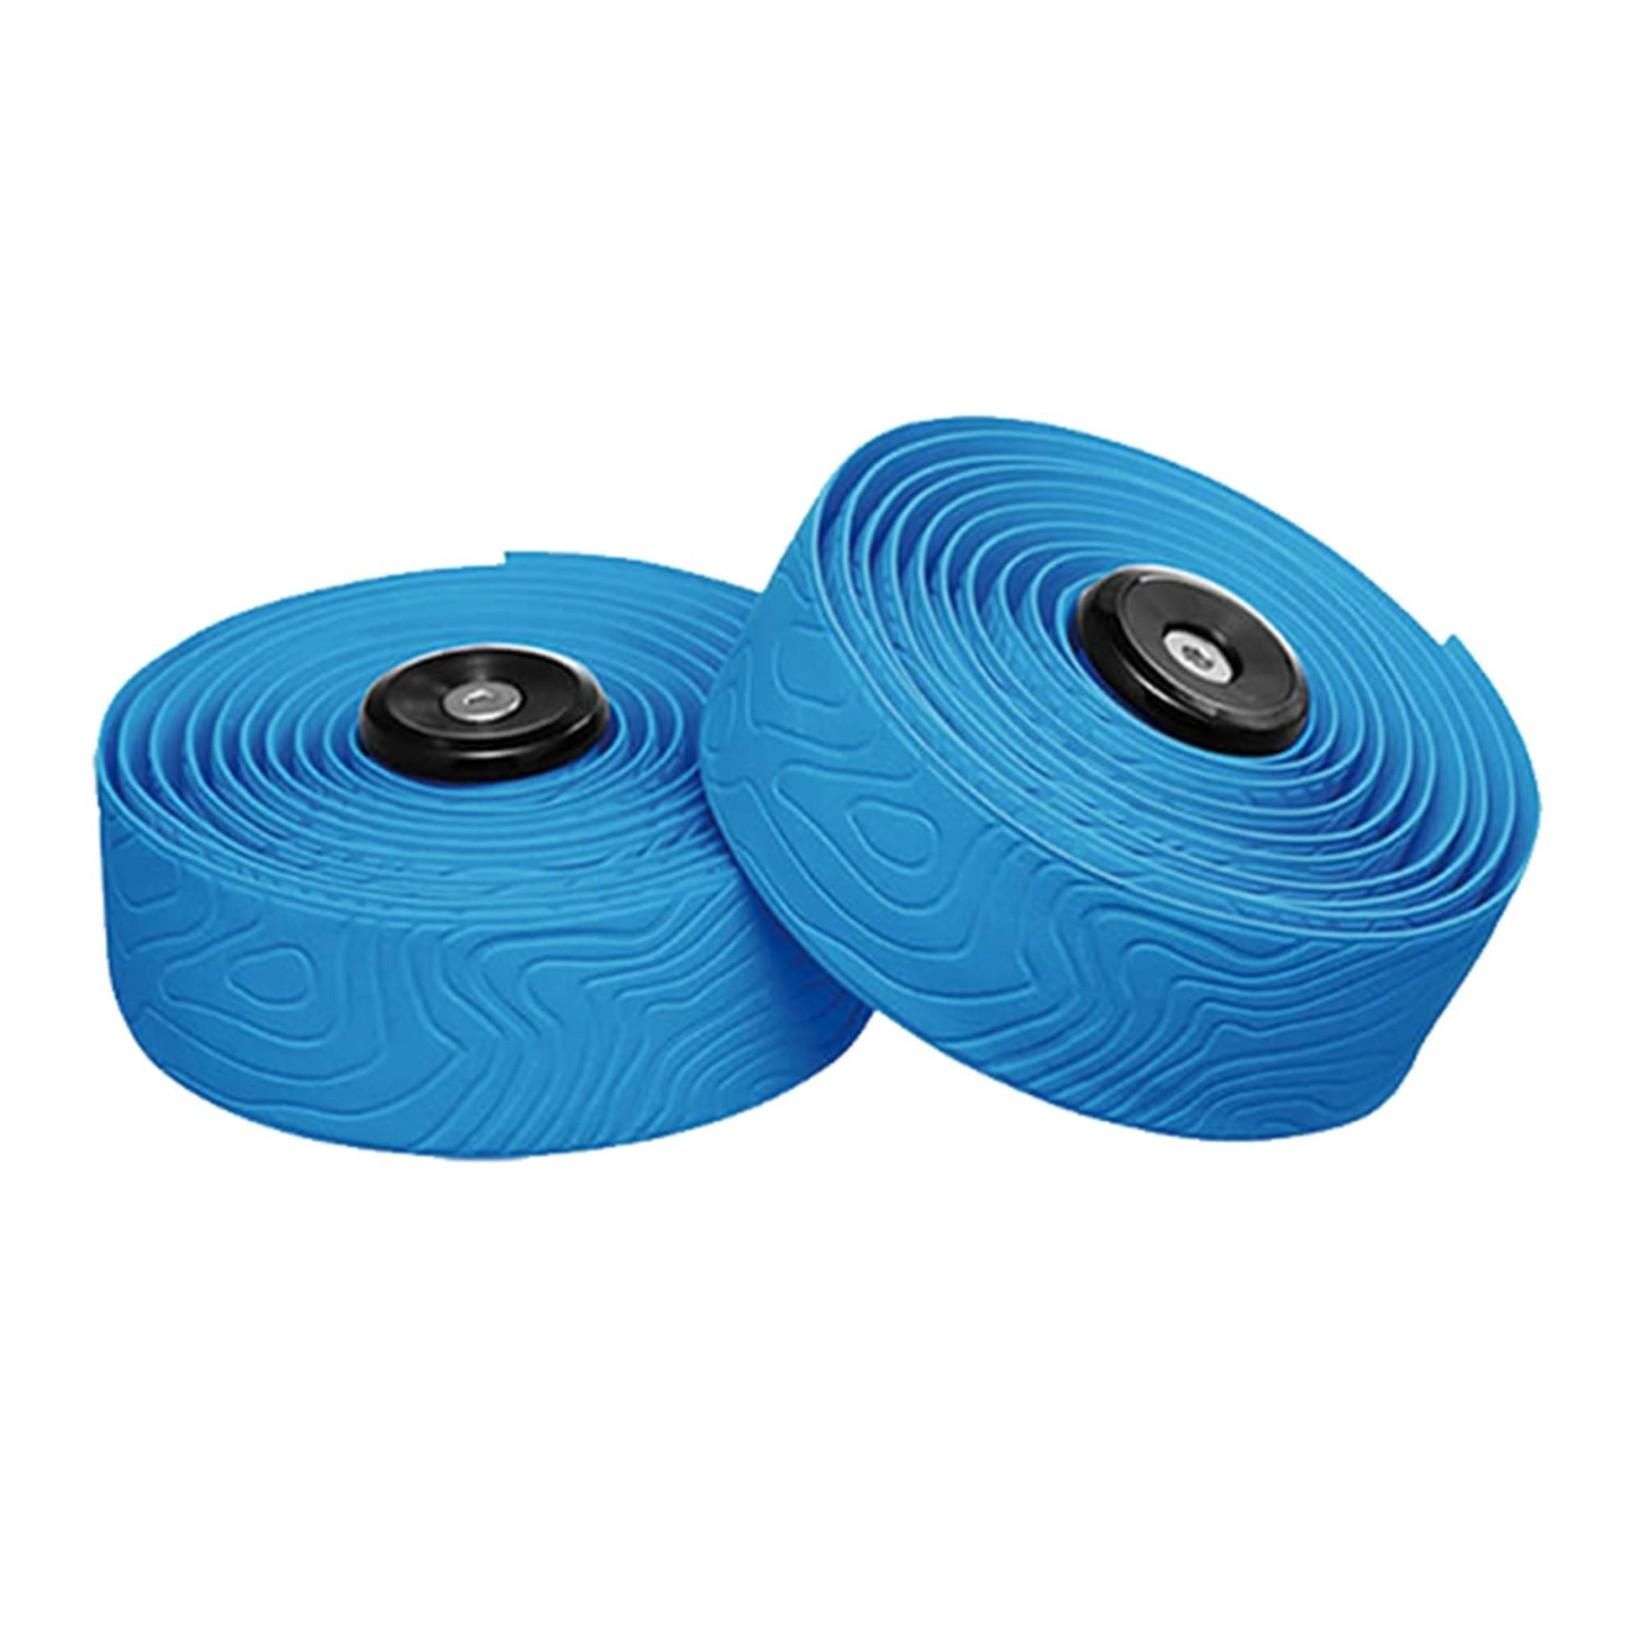 Guee Sio Duro Silicon Bar Tape  Blue